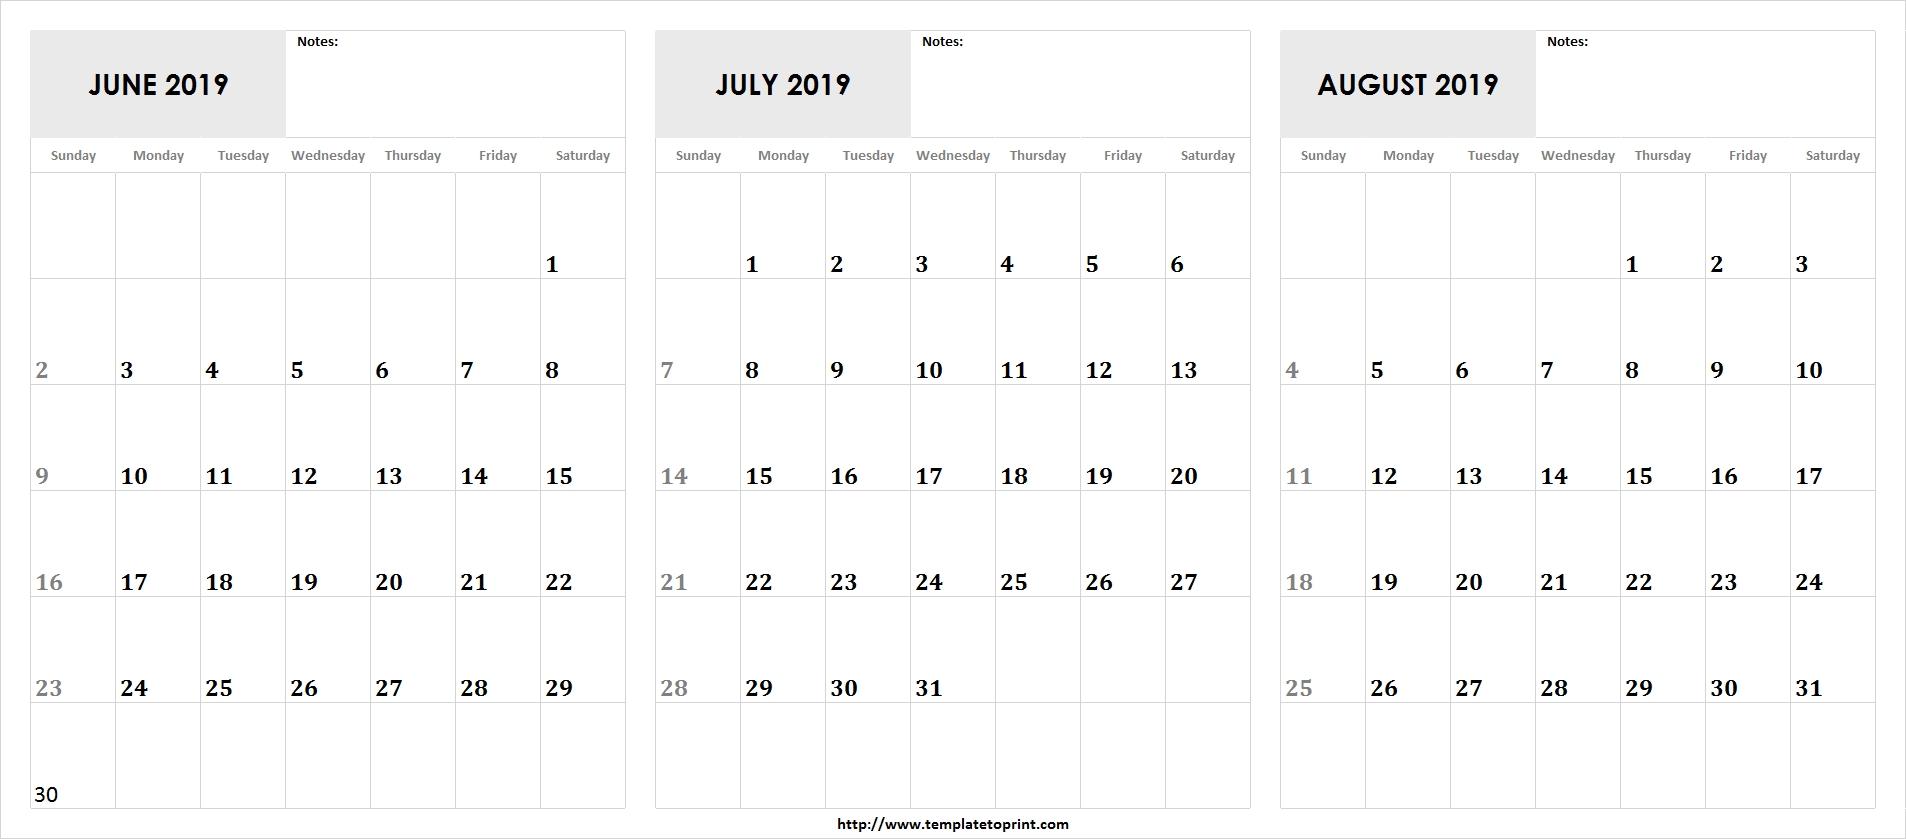 Blank-Printable-May-June-July-2019-Calendar » Template To Print Calendar 2019 June July August